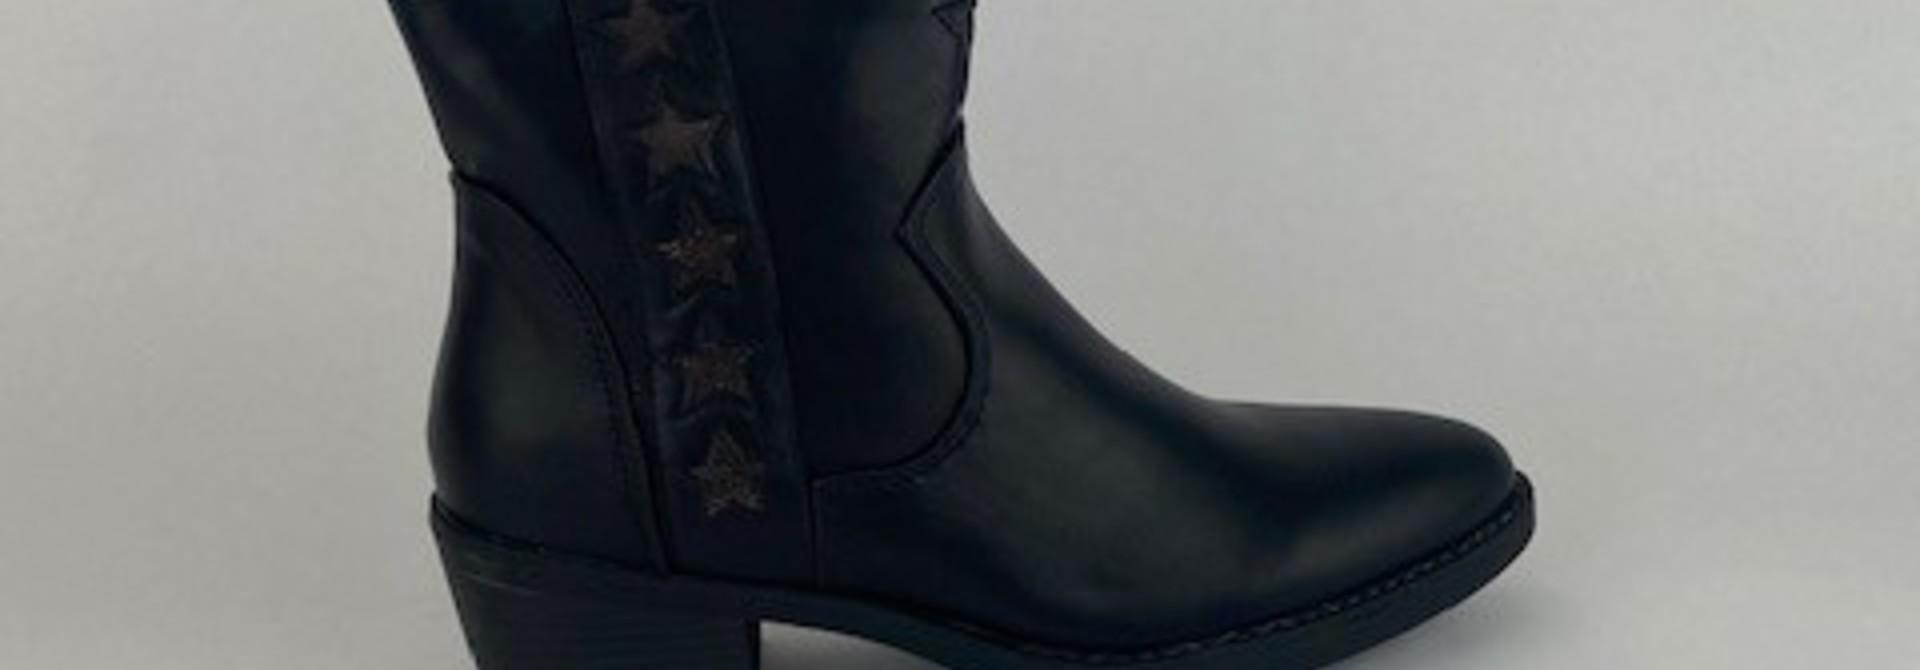 Simone boots Black